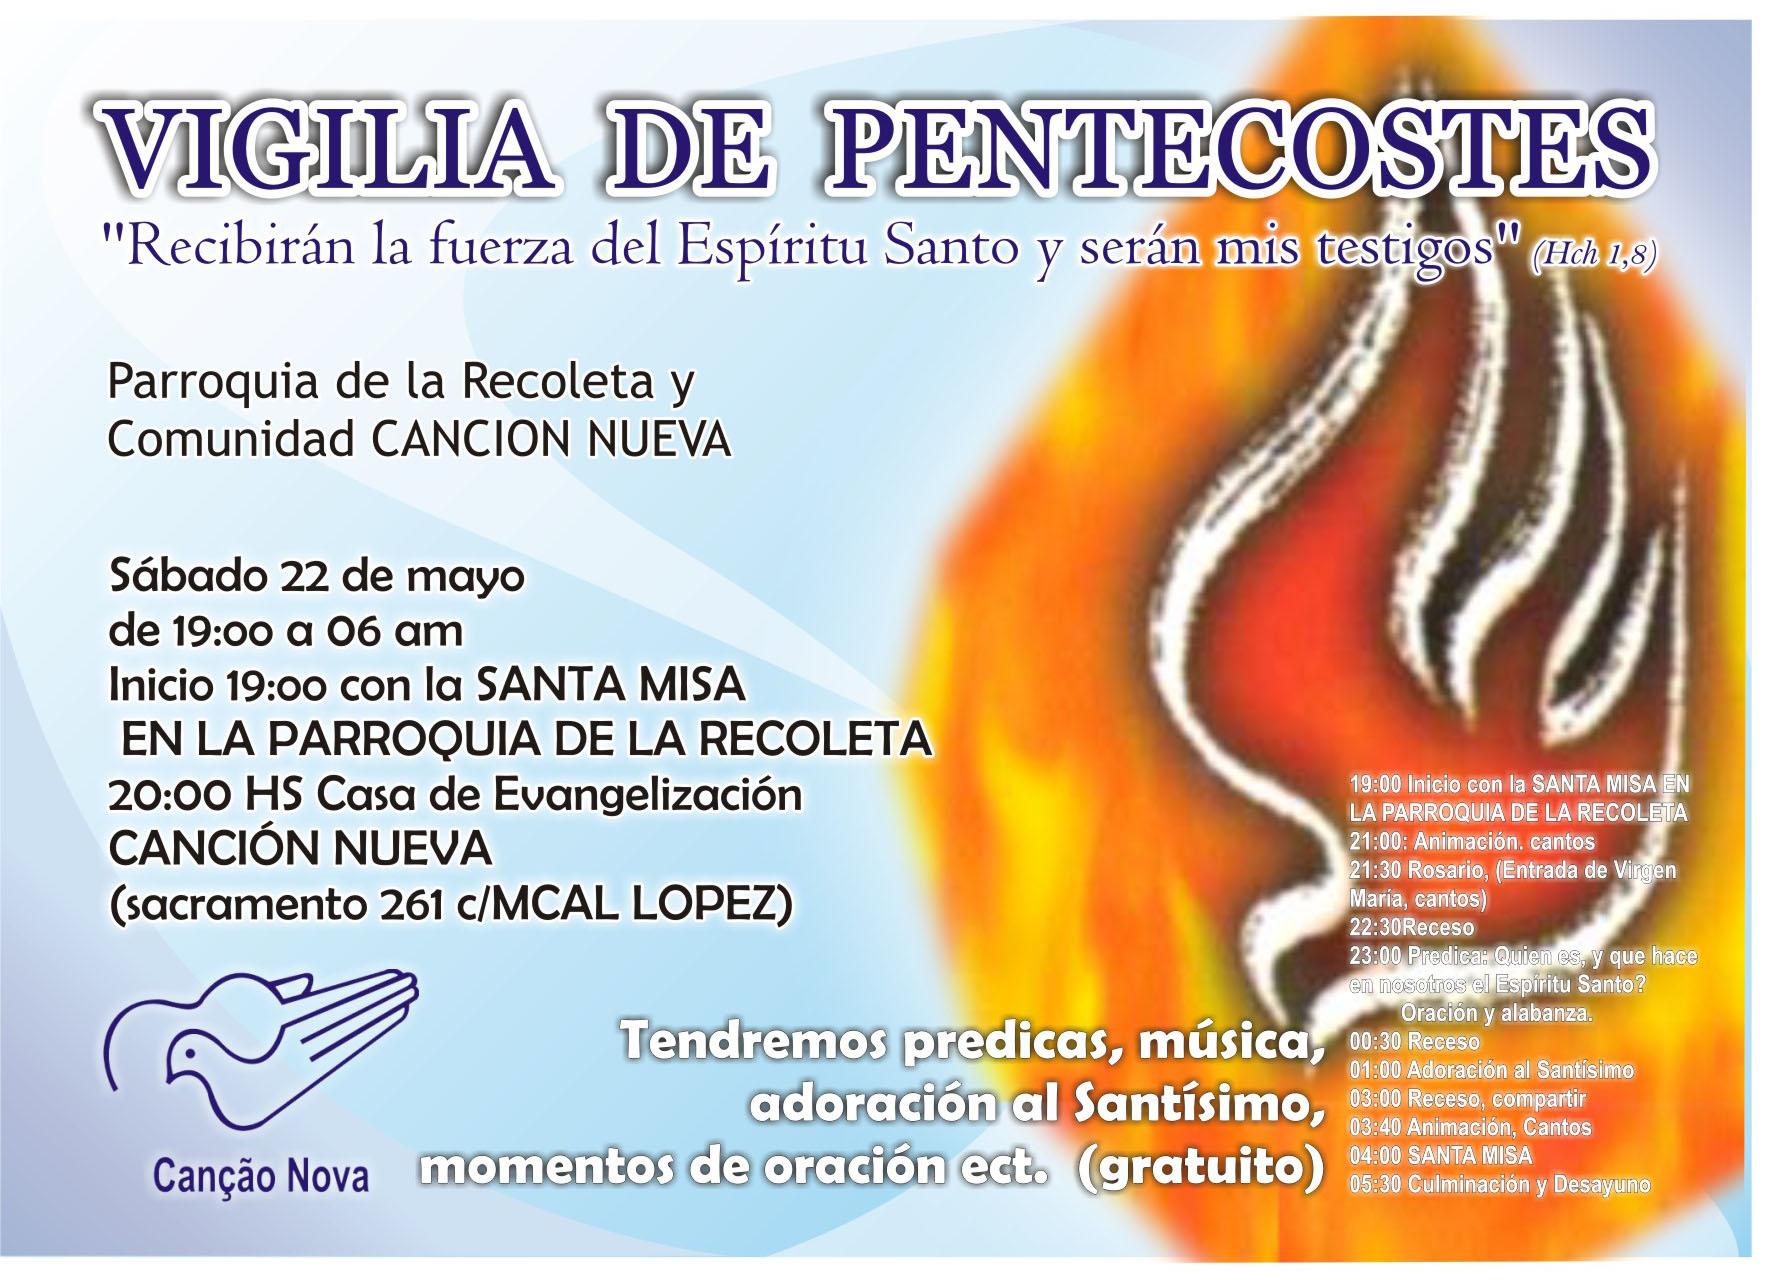 Vigilia De Pentecostés Paraguay